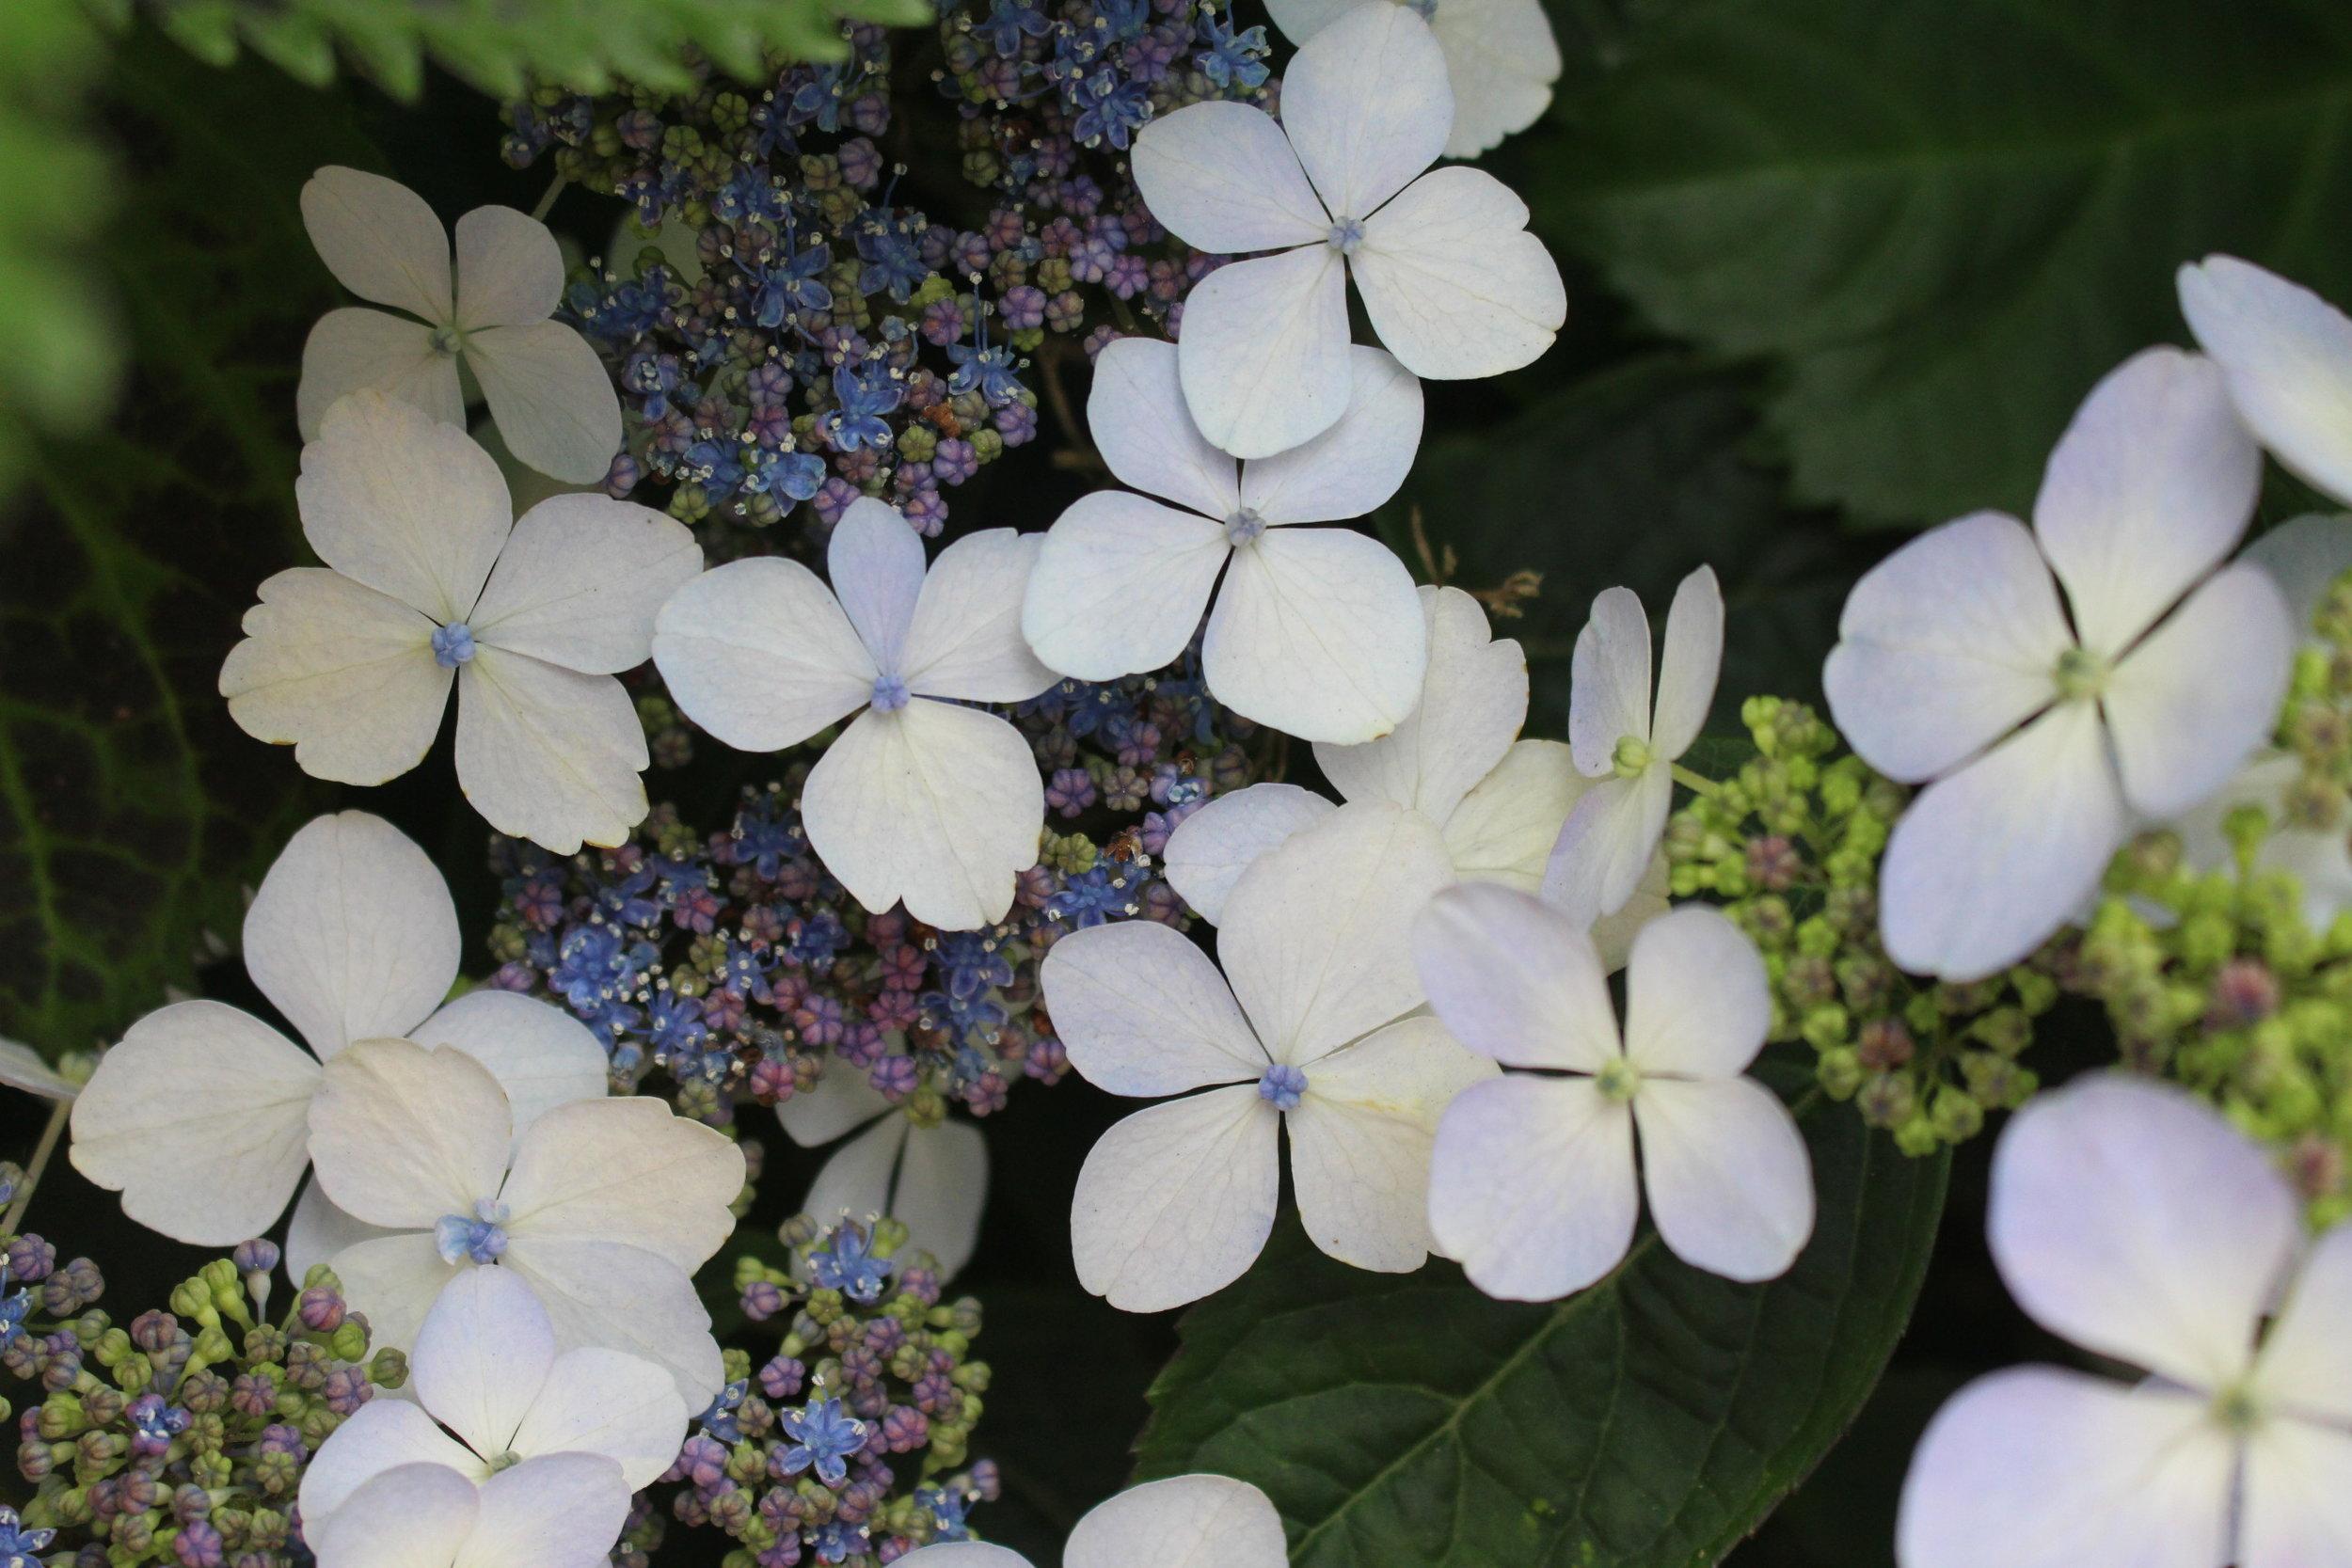 #74 Hydrangea, Hydrangea macrophylla